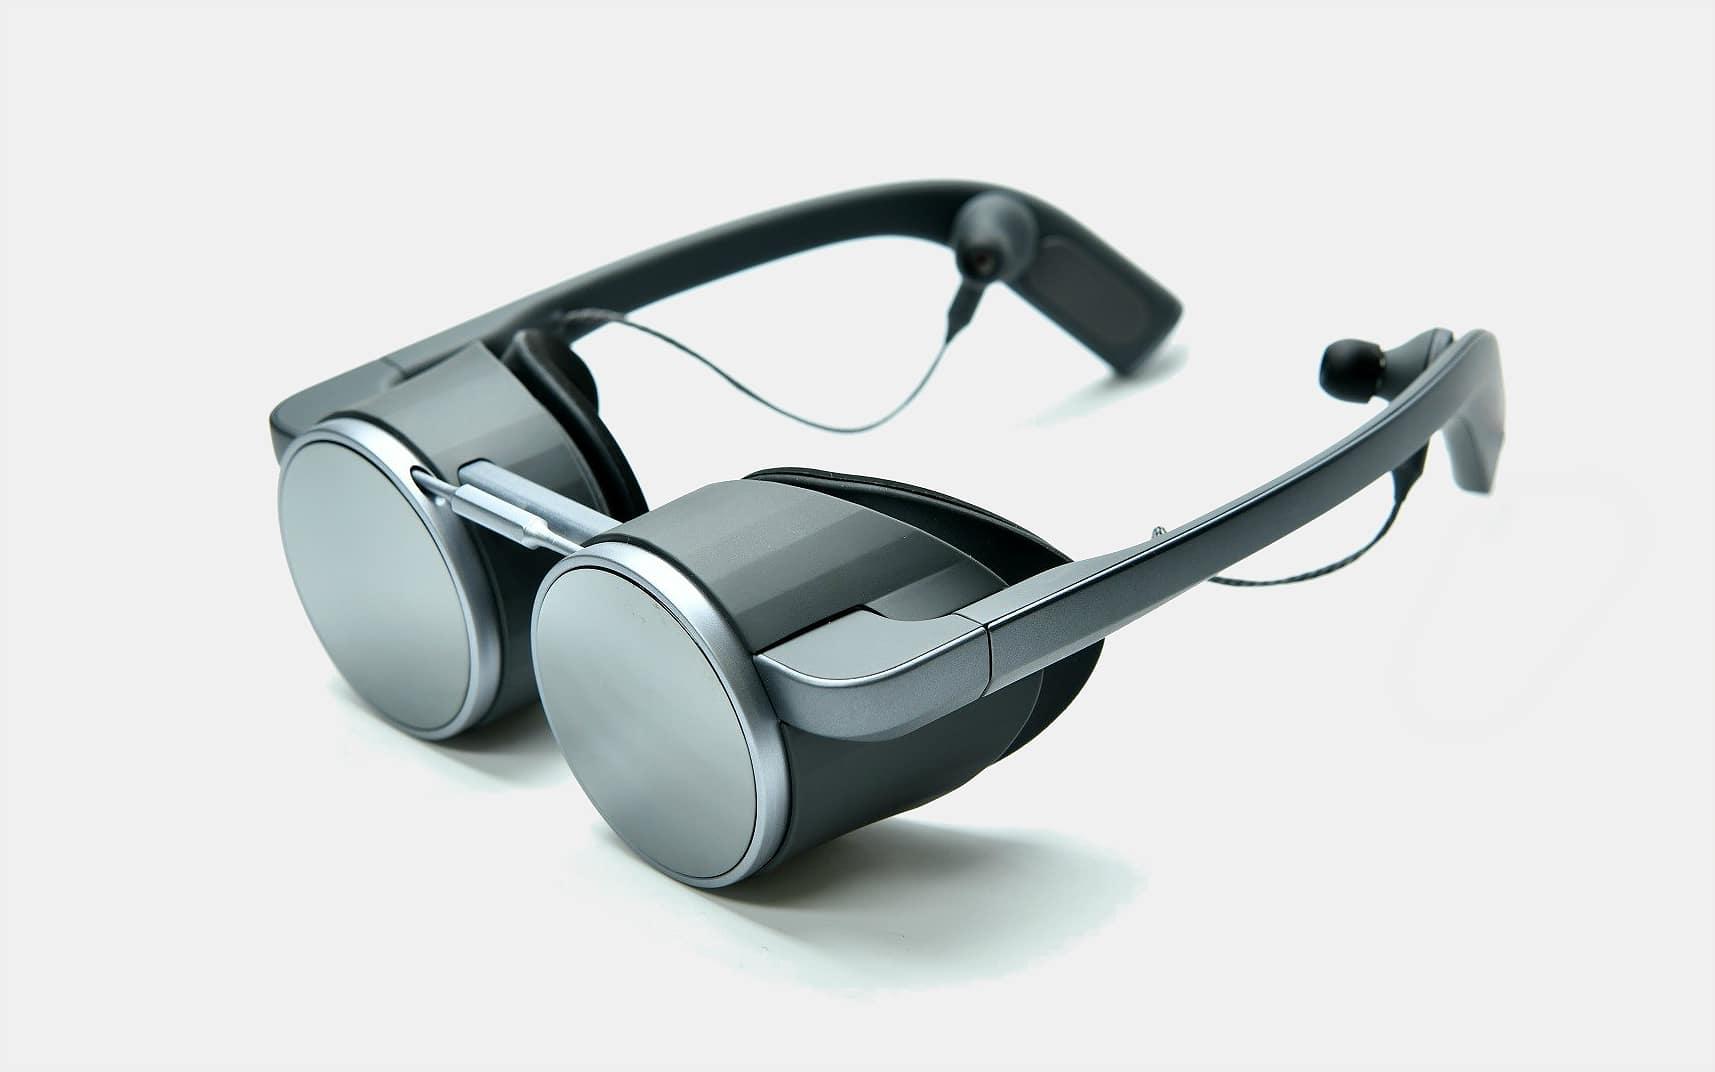 Panasonic HDR UHD VR Glasses